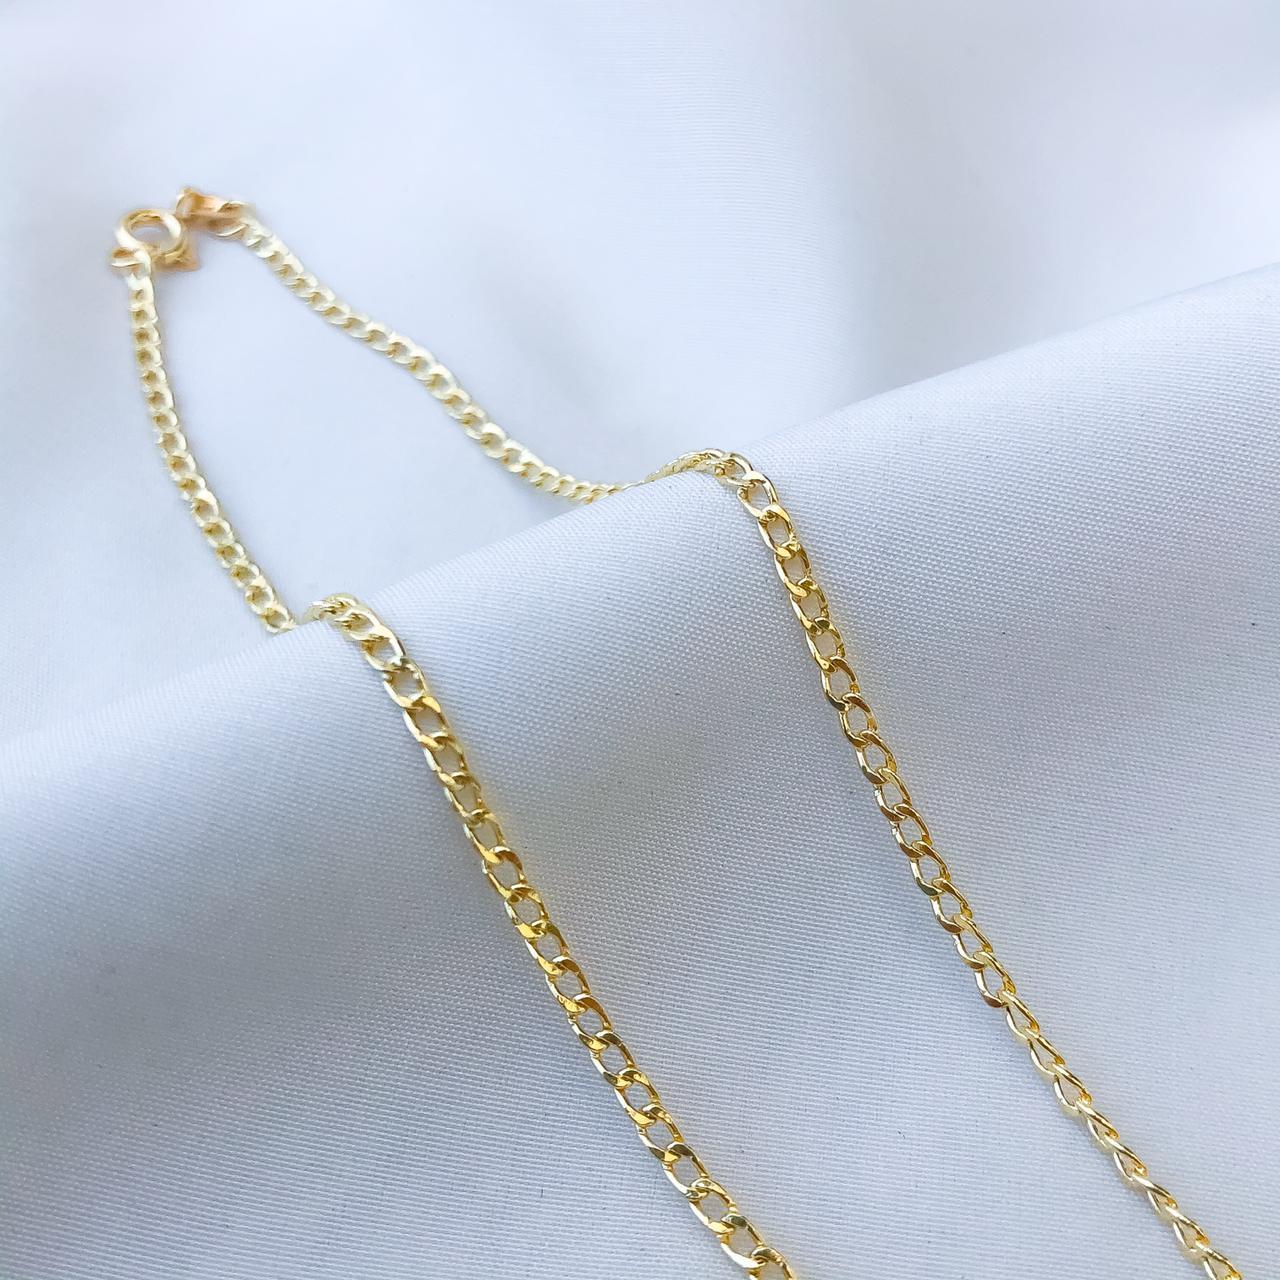 Corrente Groumet Curto em Ouro 18K 45cm